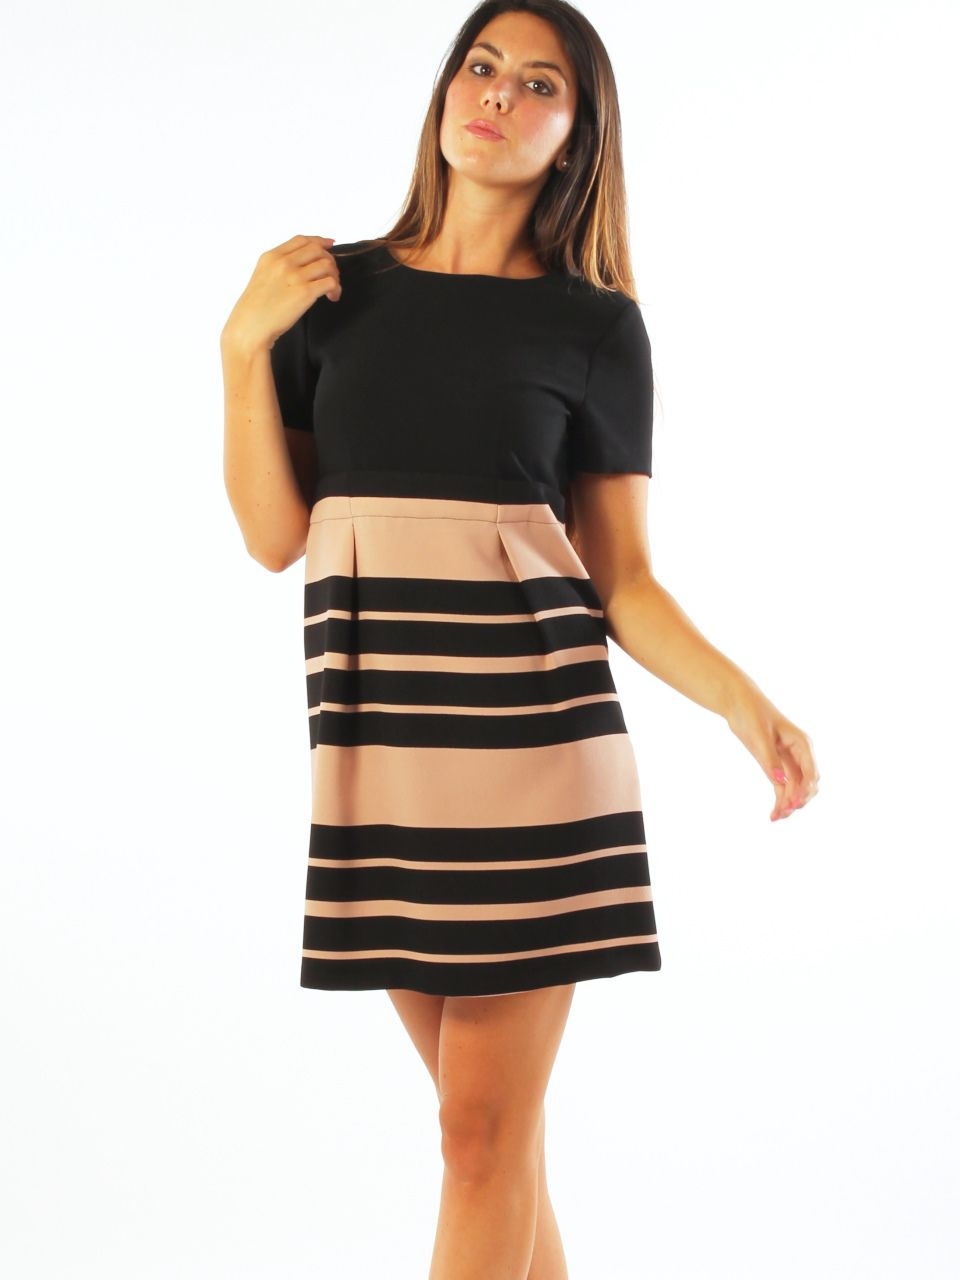 Short comfort crêpe casual dress. Key-di http://www.luanaromizi.com/en/dresses-woman/short-comfort-crepe-casual-dress.html #Short #comfort #crêpe #casual #dress #keydi #madeinitaly #luanaromizi